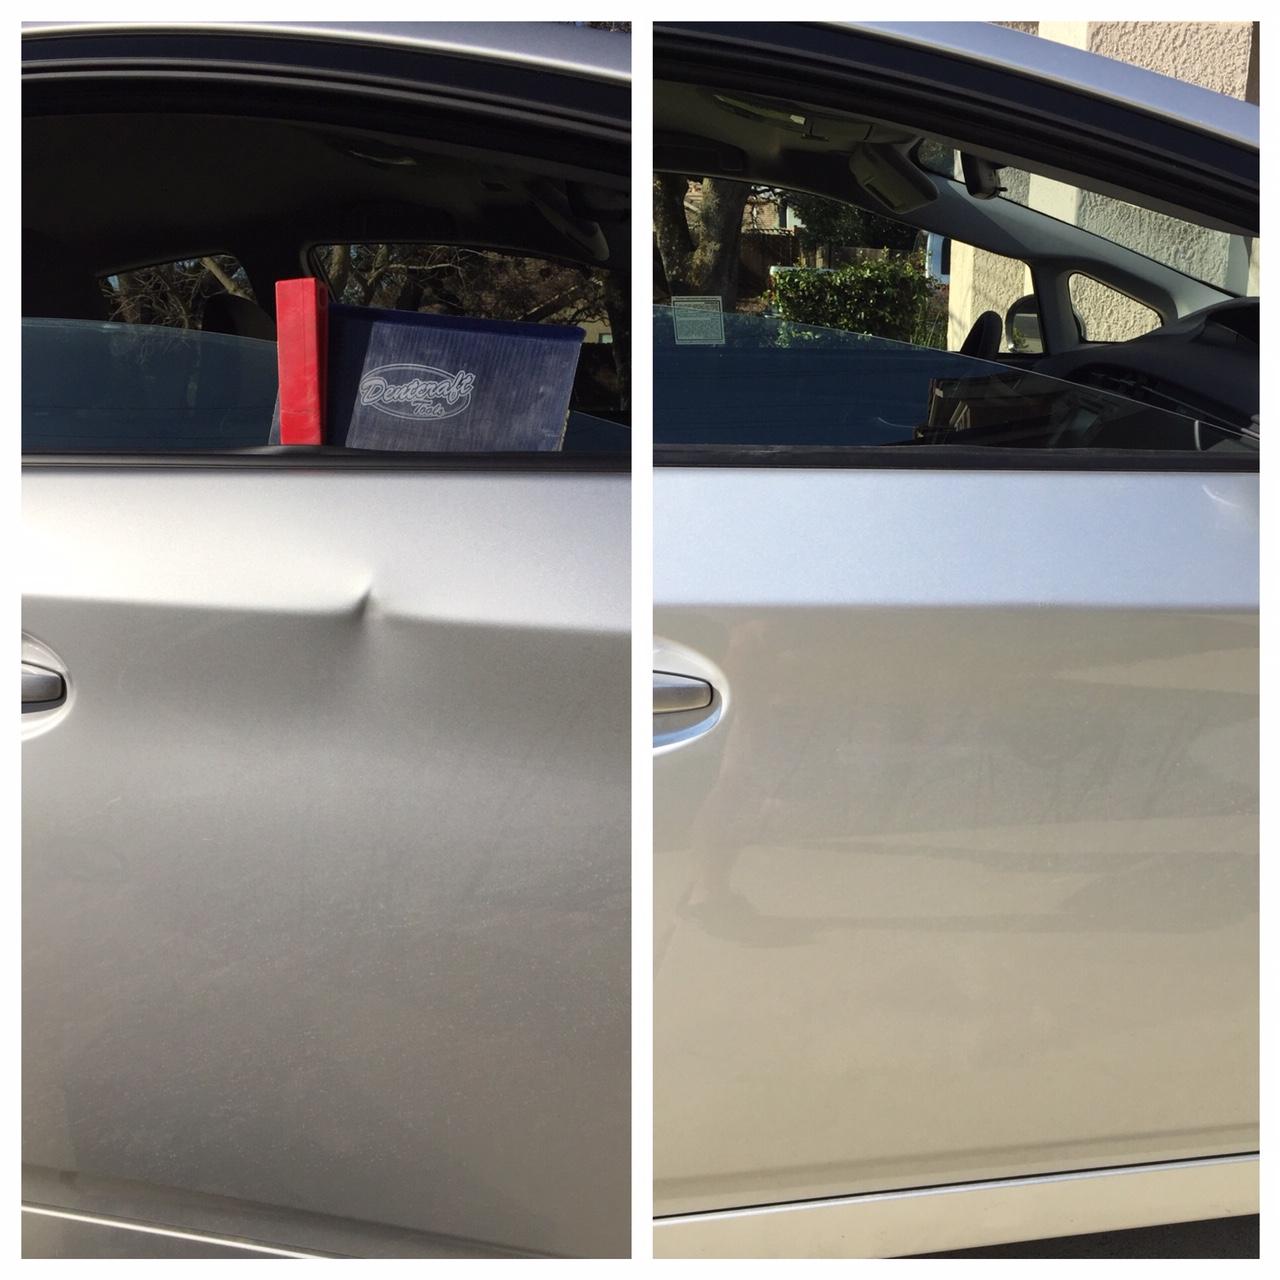 paintless dent removal Prius Carmichael